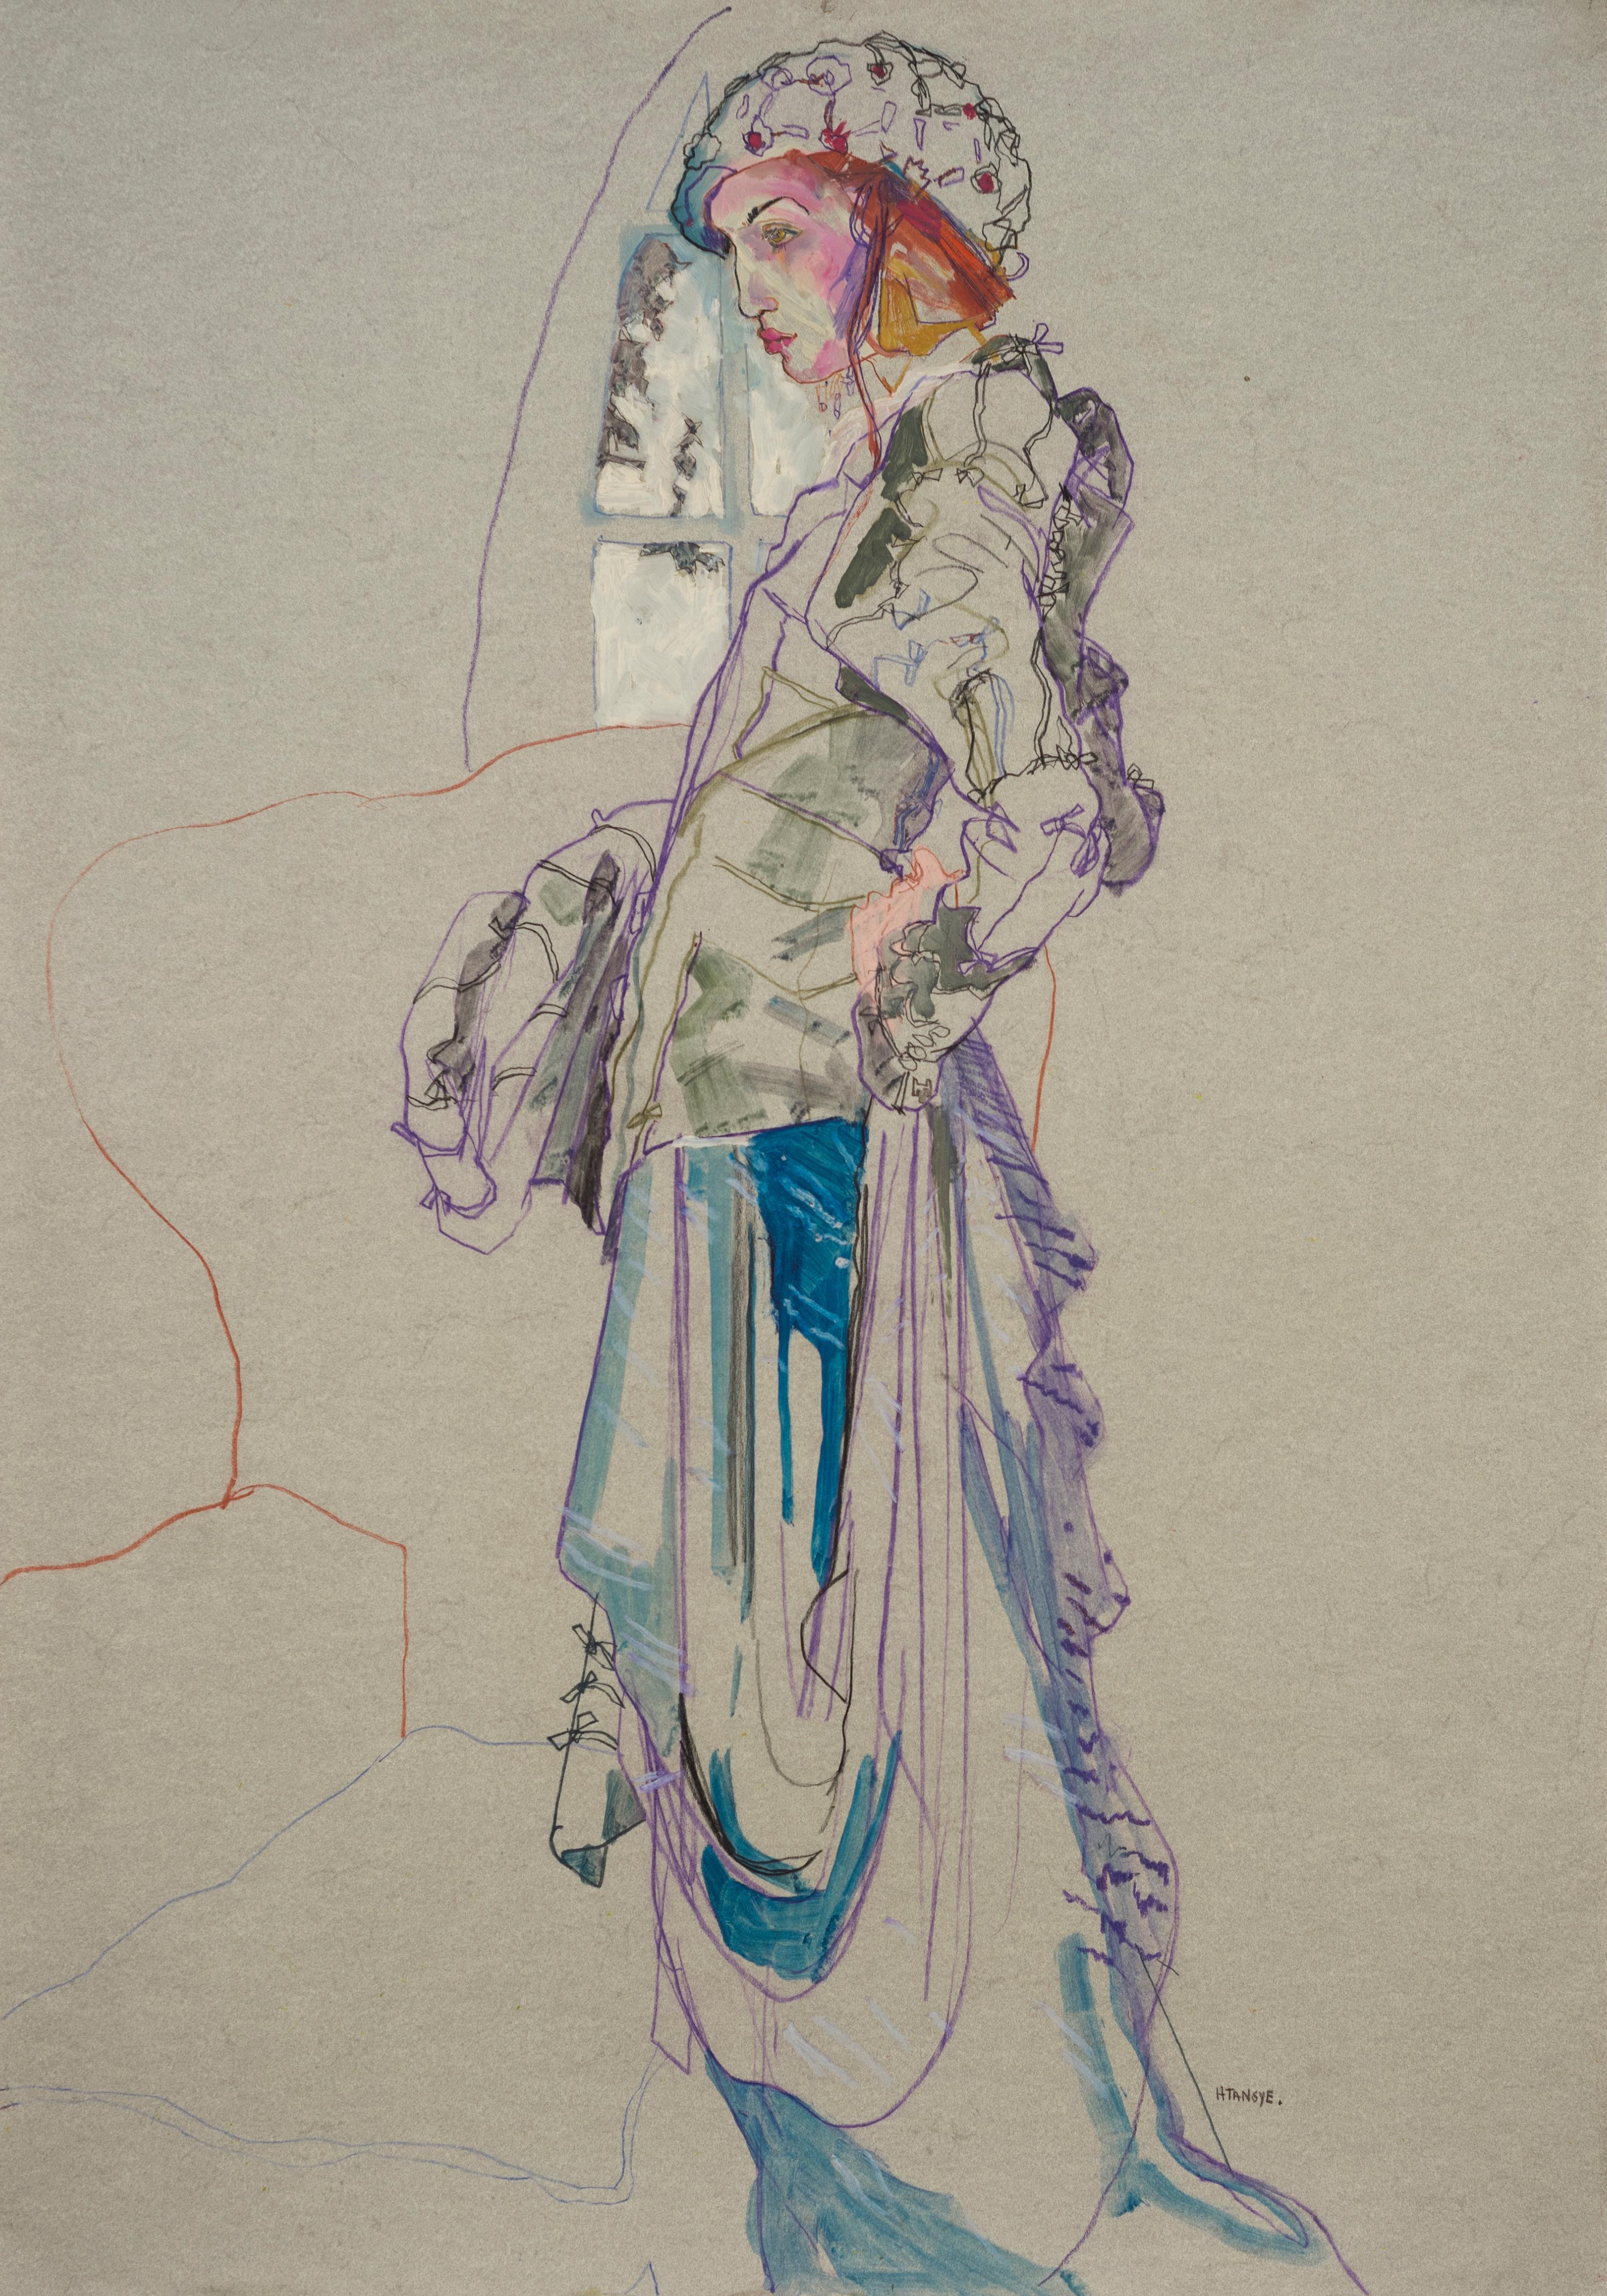 Elodie (Galliano Paris - Beret), Mixed Media on grey paper